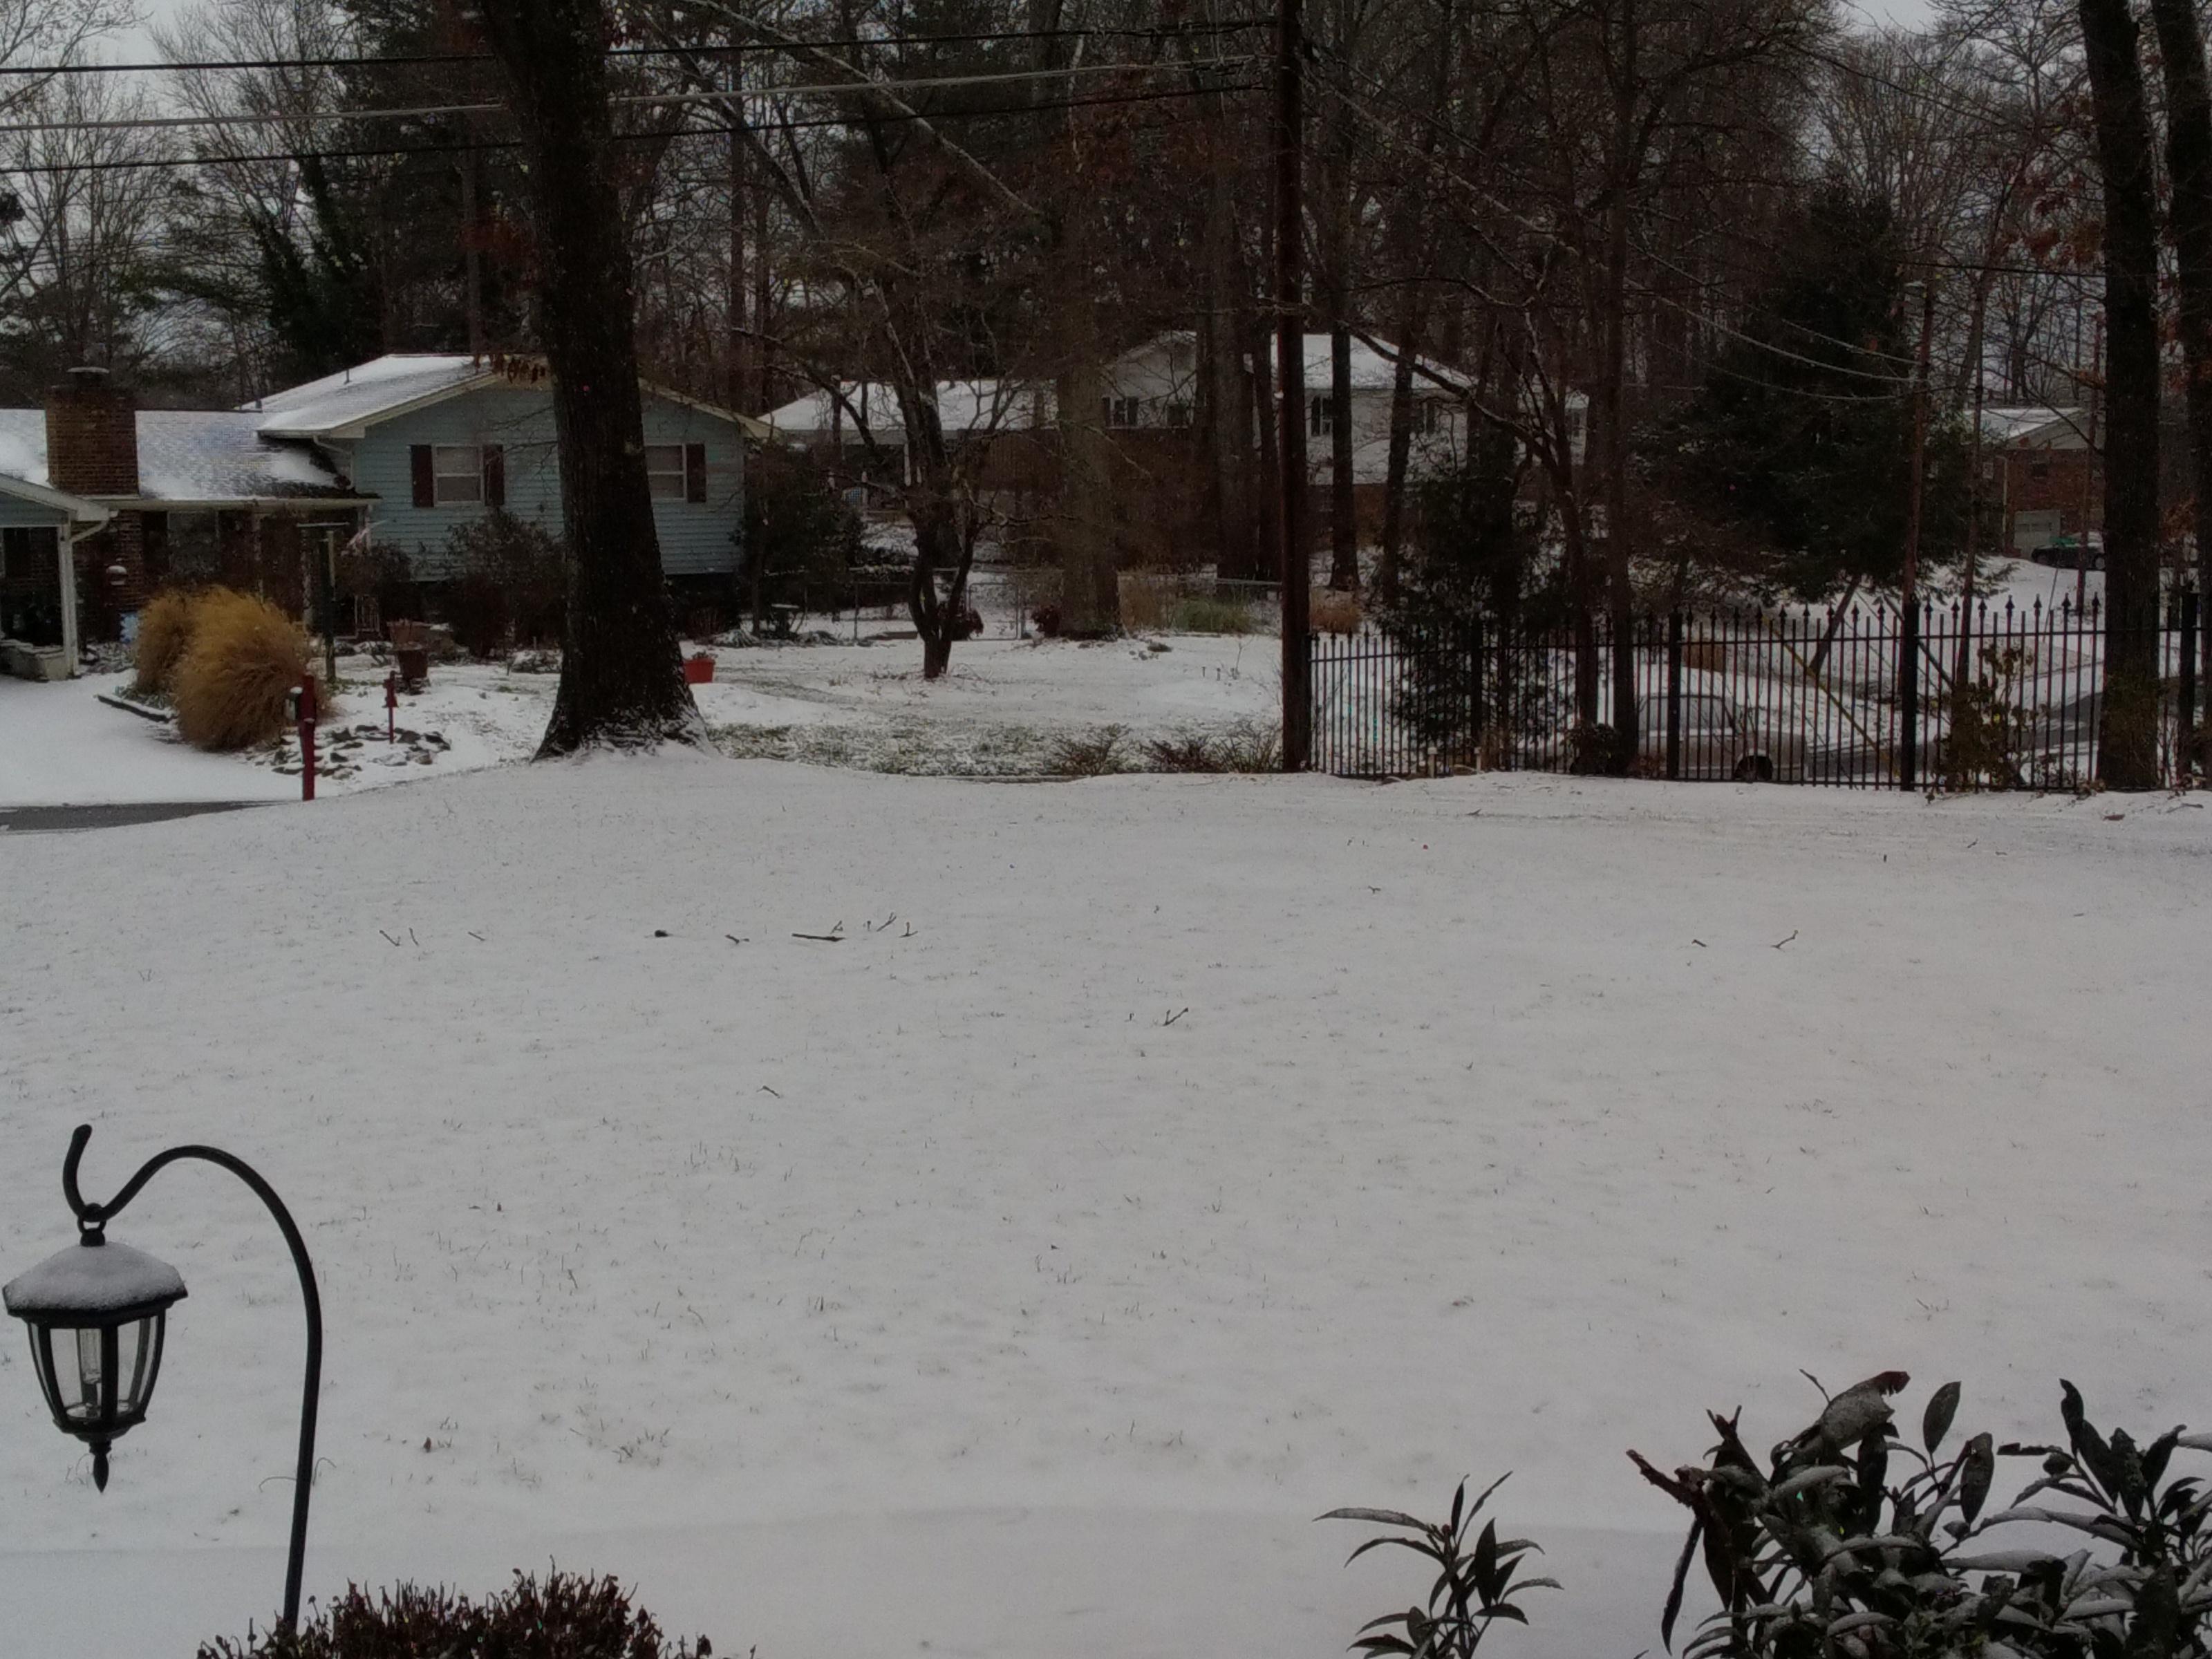 Snow - front yard